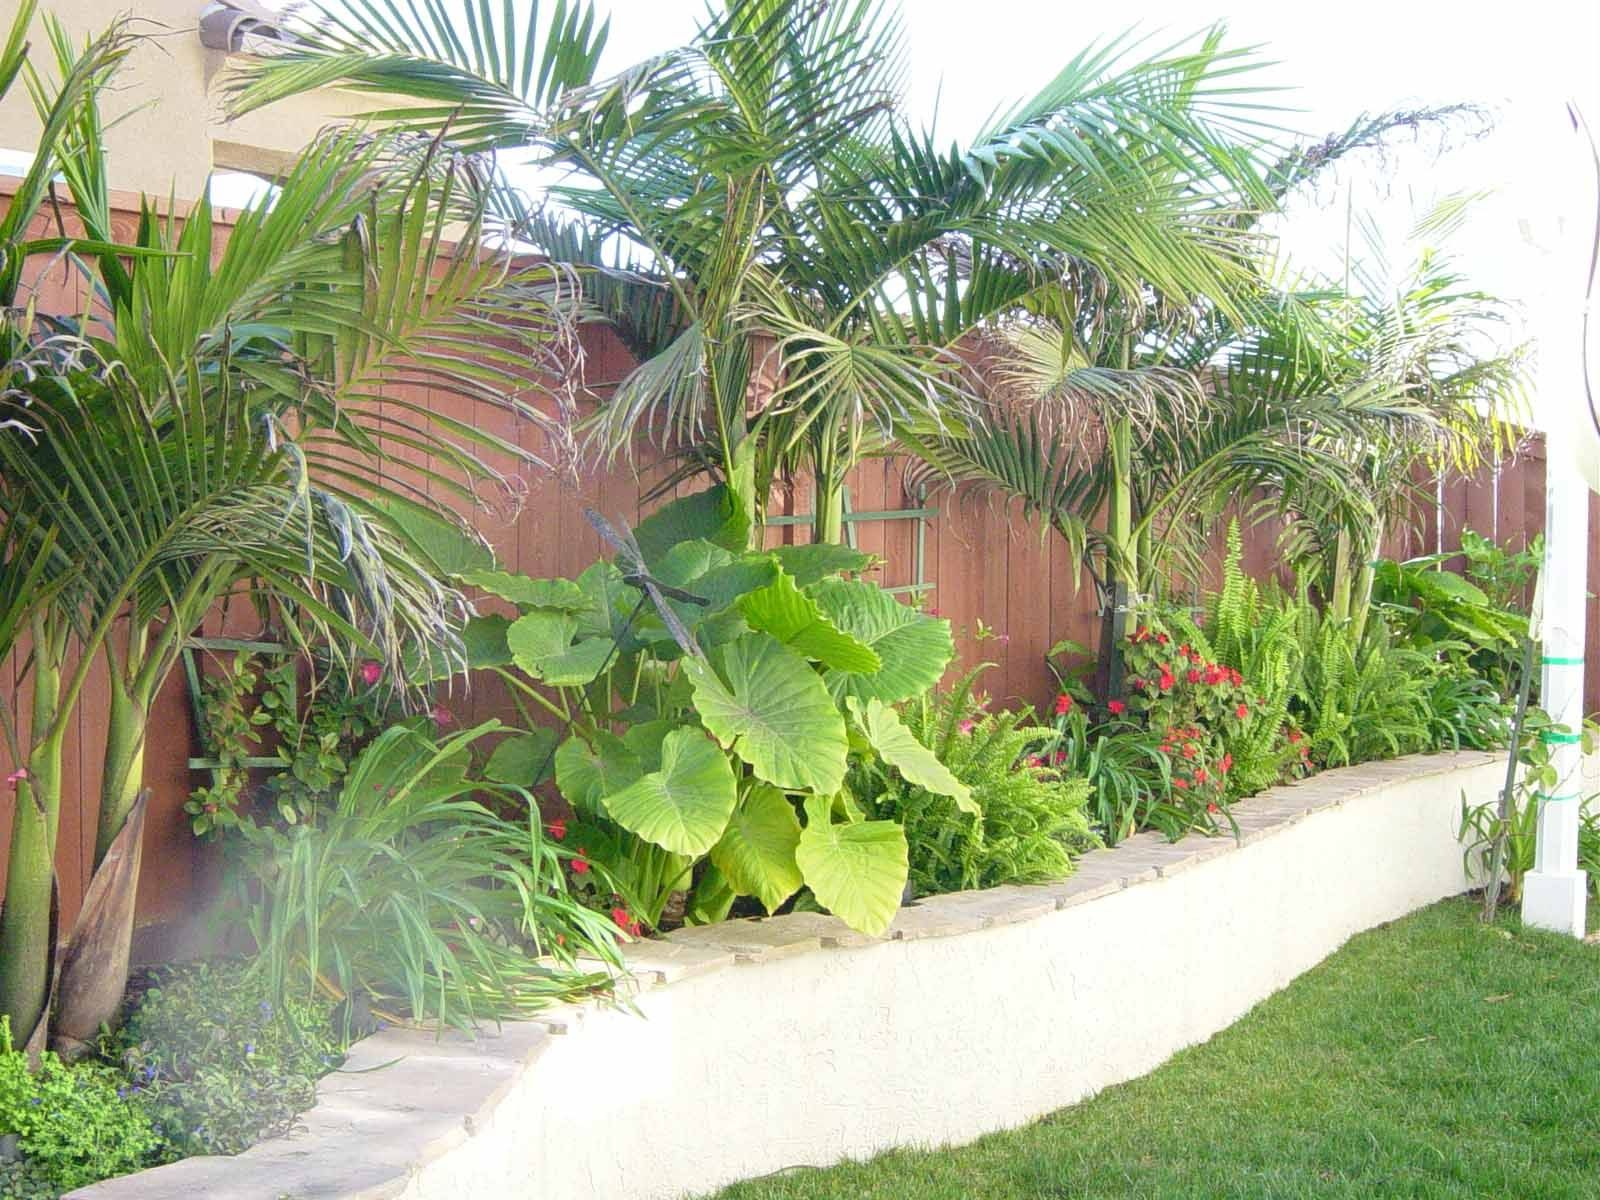 Retaining Wall Plant Design Tropical Backyard Landscaping Tropical Landscape Design Tropical Landscaping